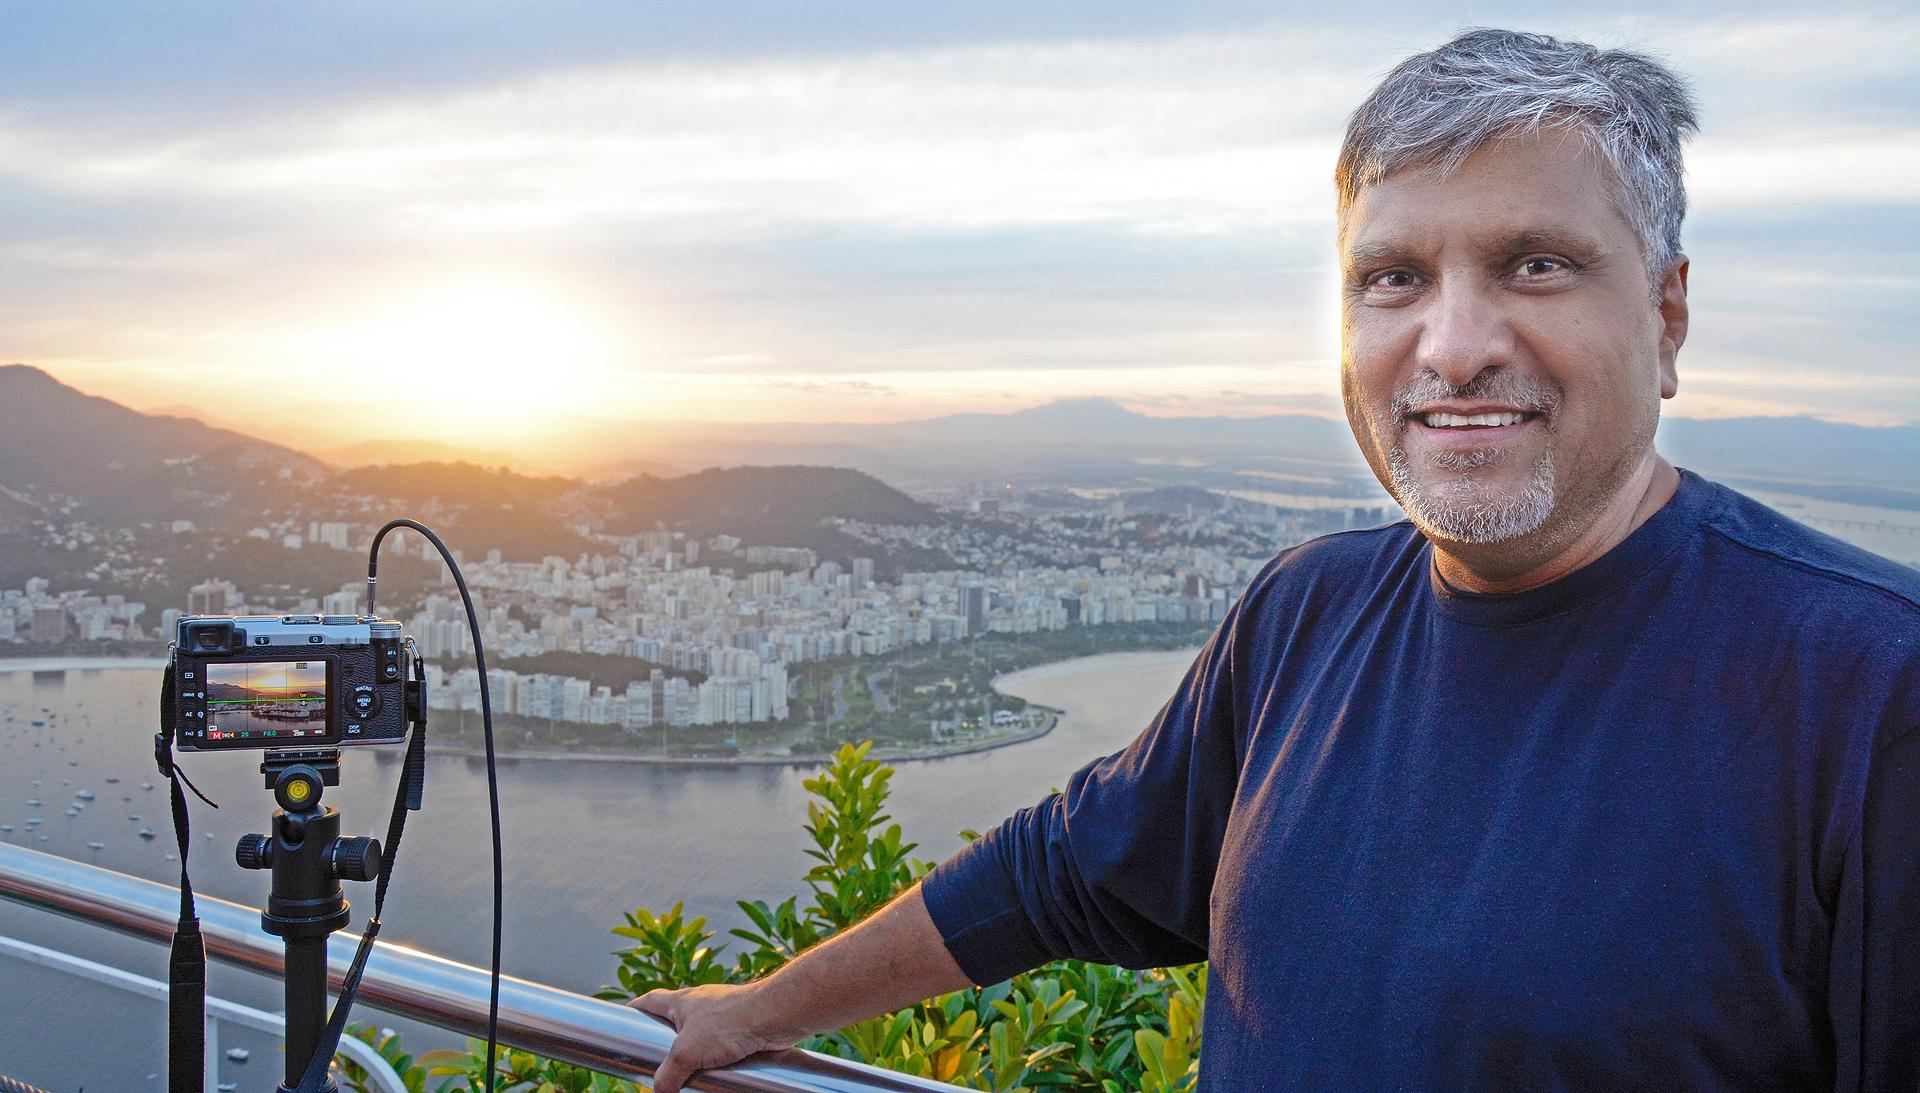 18 August 2015 - Rio de Janeiro, Brazil                                                              photo: courtesy of Renata Marins, Rio Photo Guide